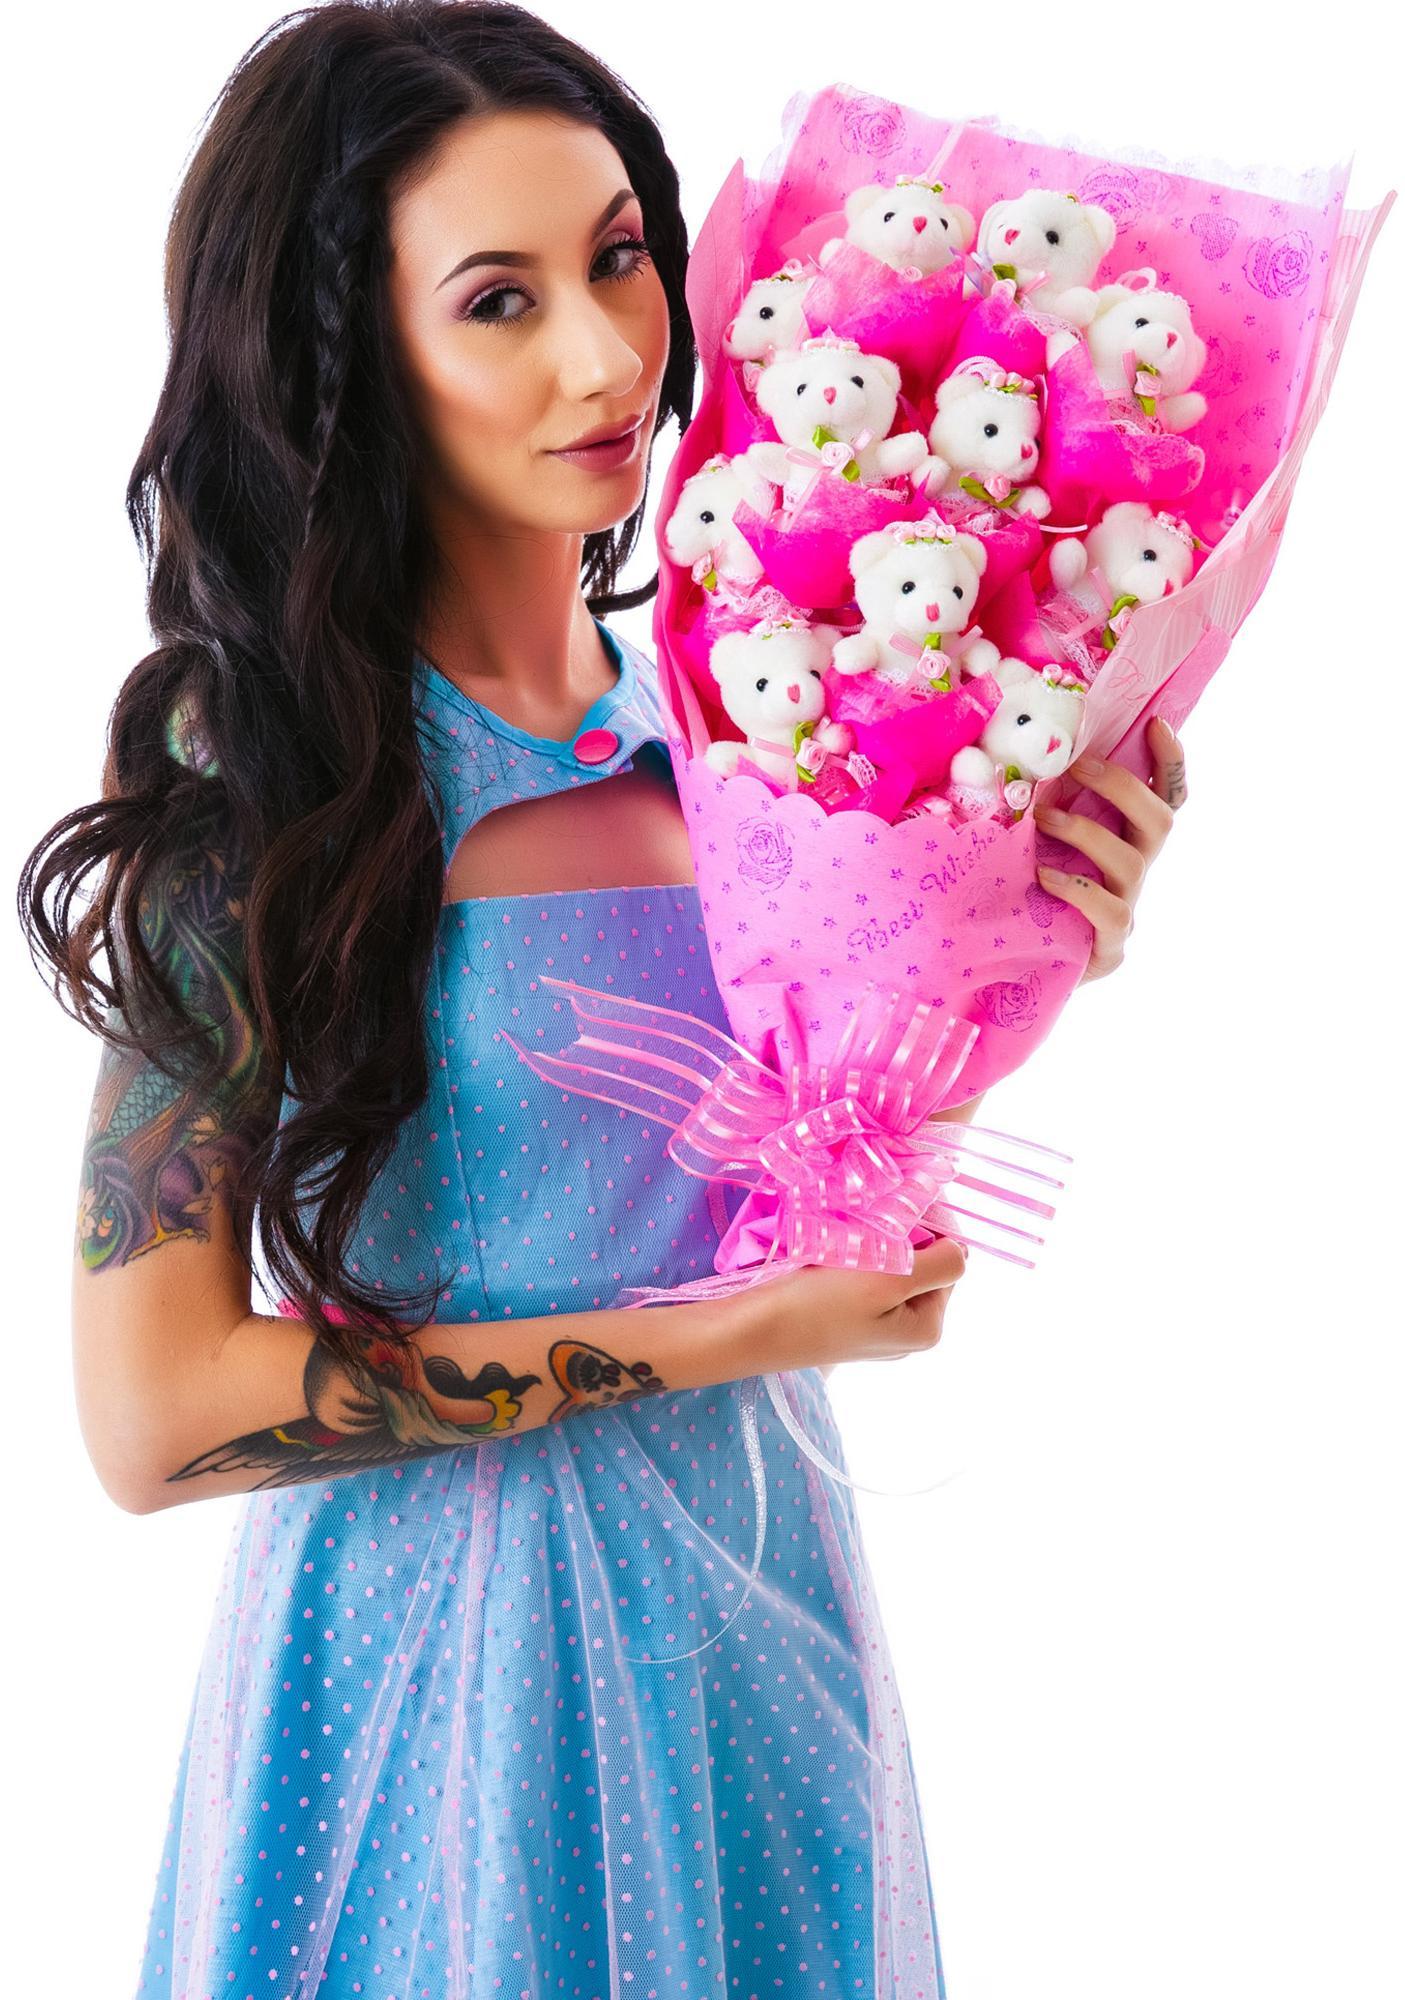 Baby Bear Bouquet